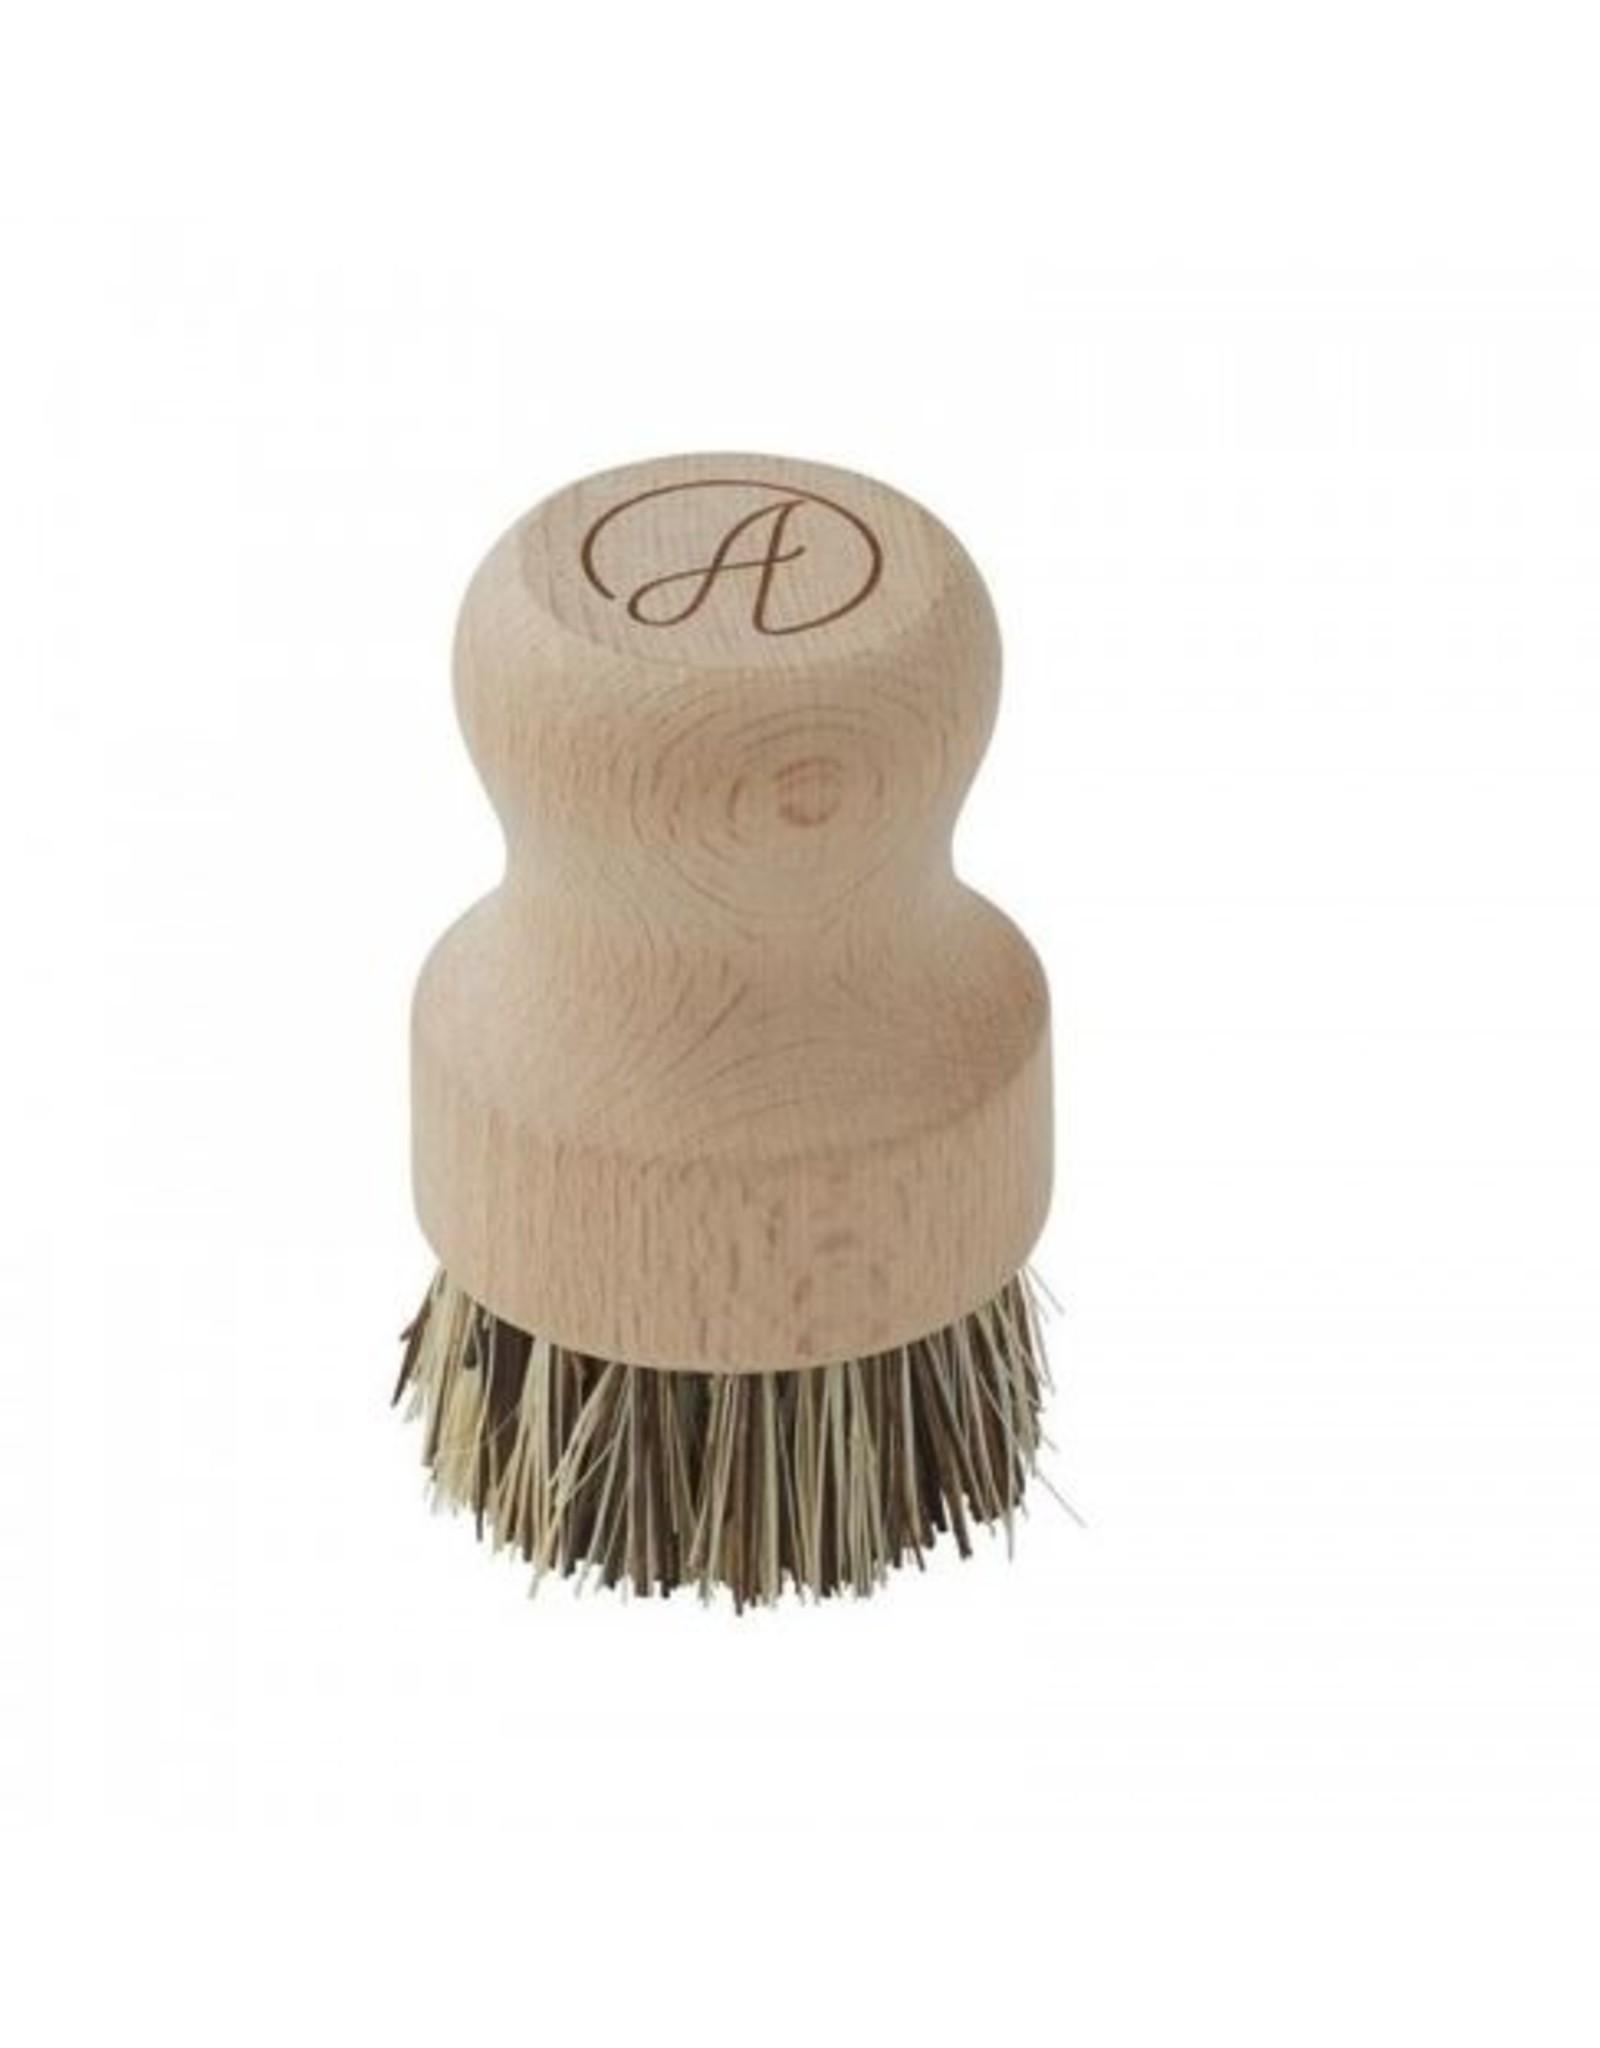 Academy Dickens Pot Scrub Brush